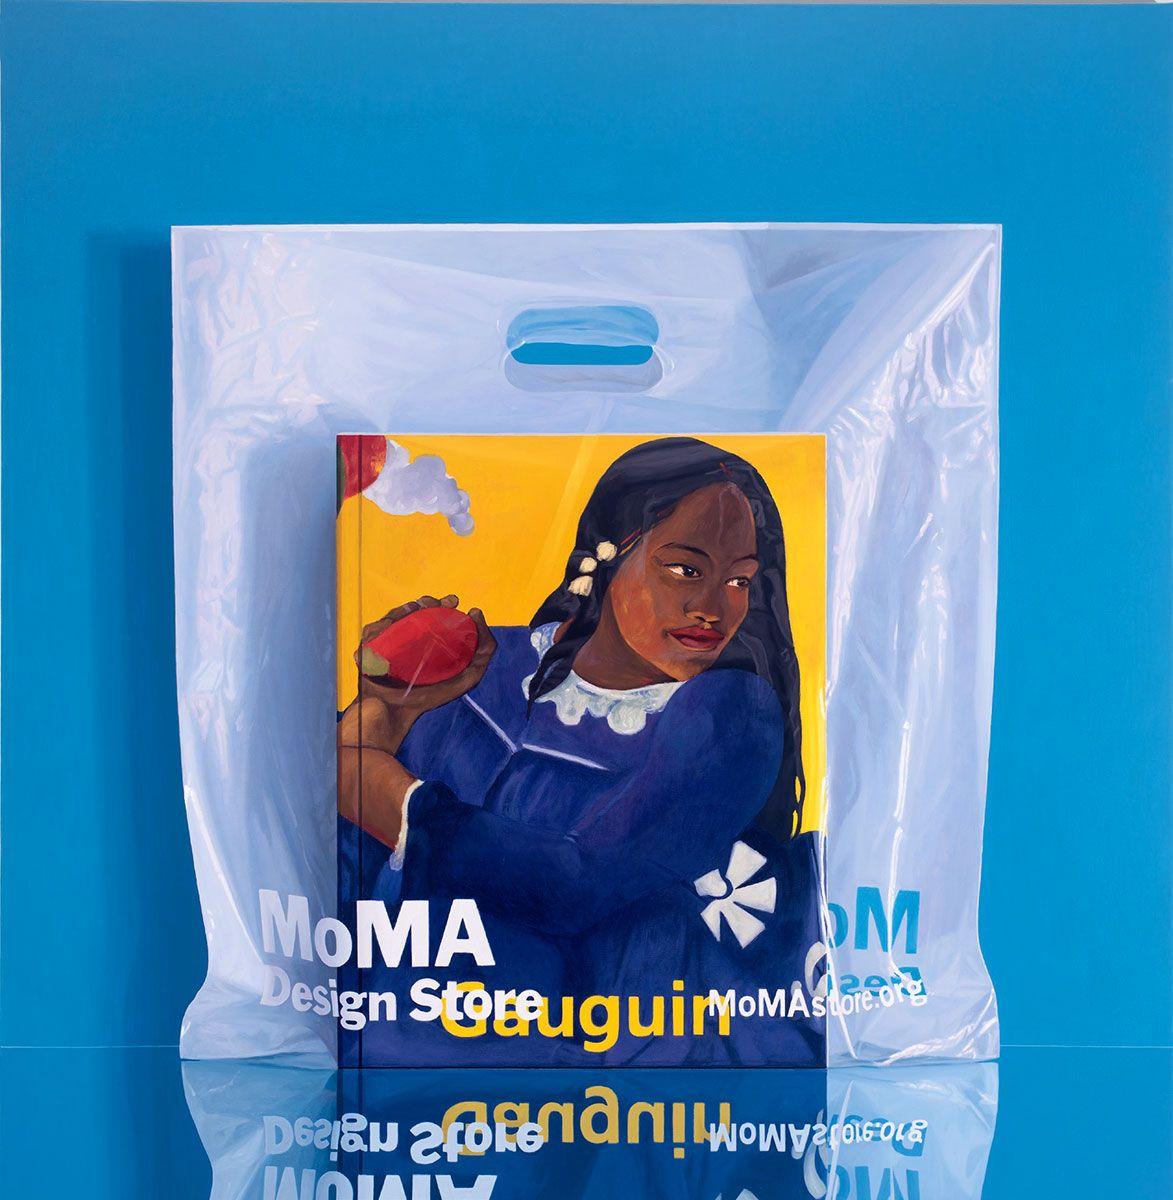 Gauguin-MOMA-Carlos-Vega-Faundez